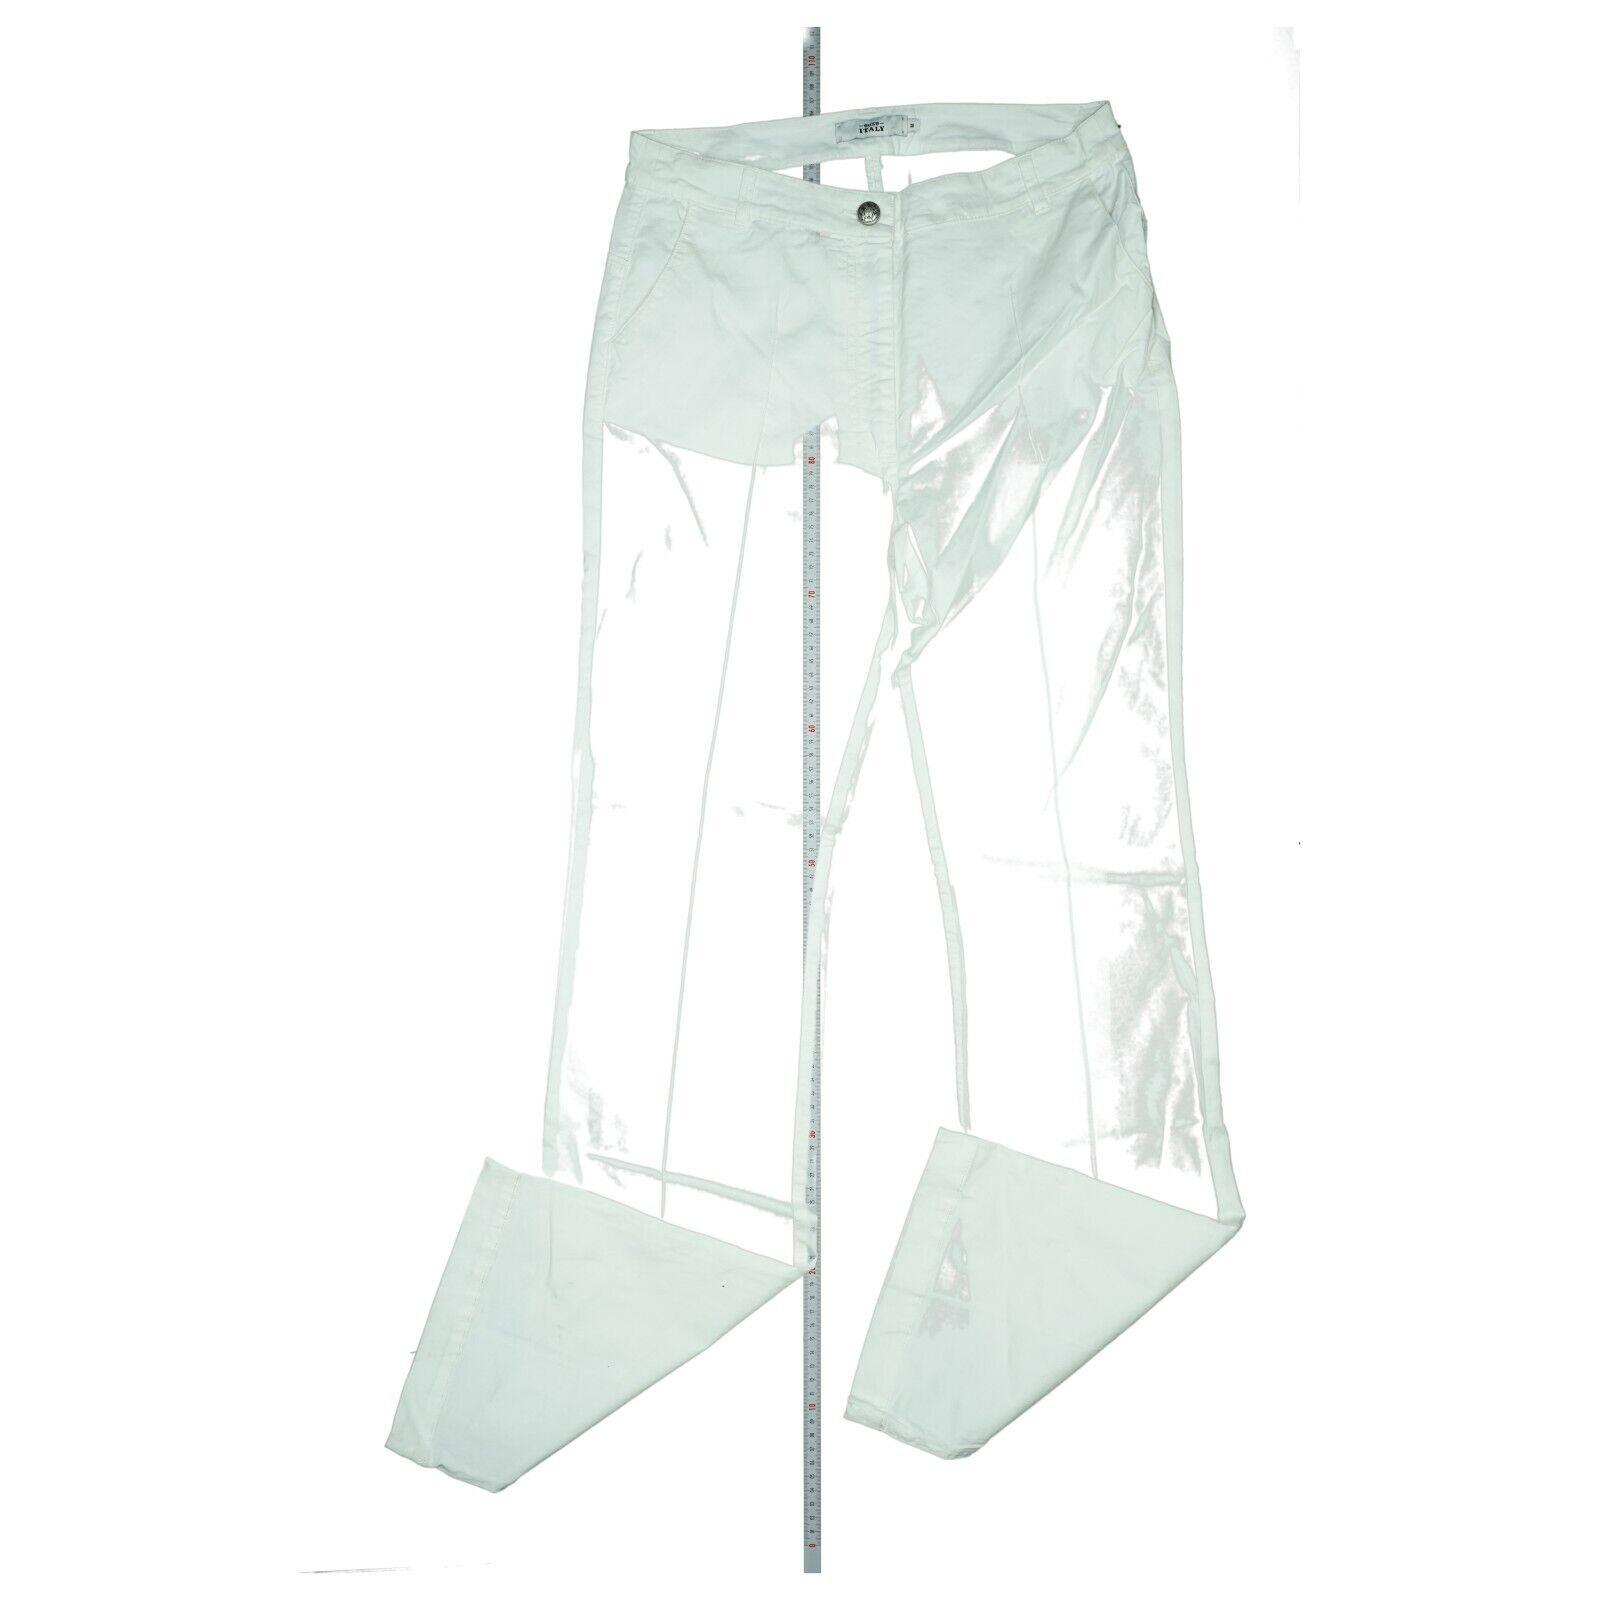 0039 ITALY super stretch Jeans Hose Bootcut Schlag high Waist Sommer M L34 Weiß